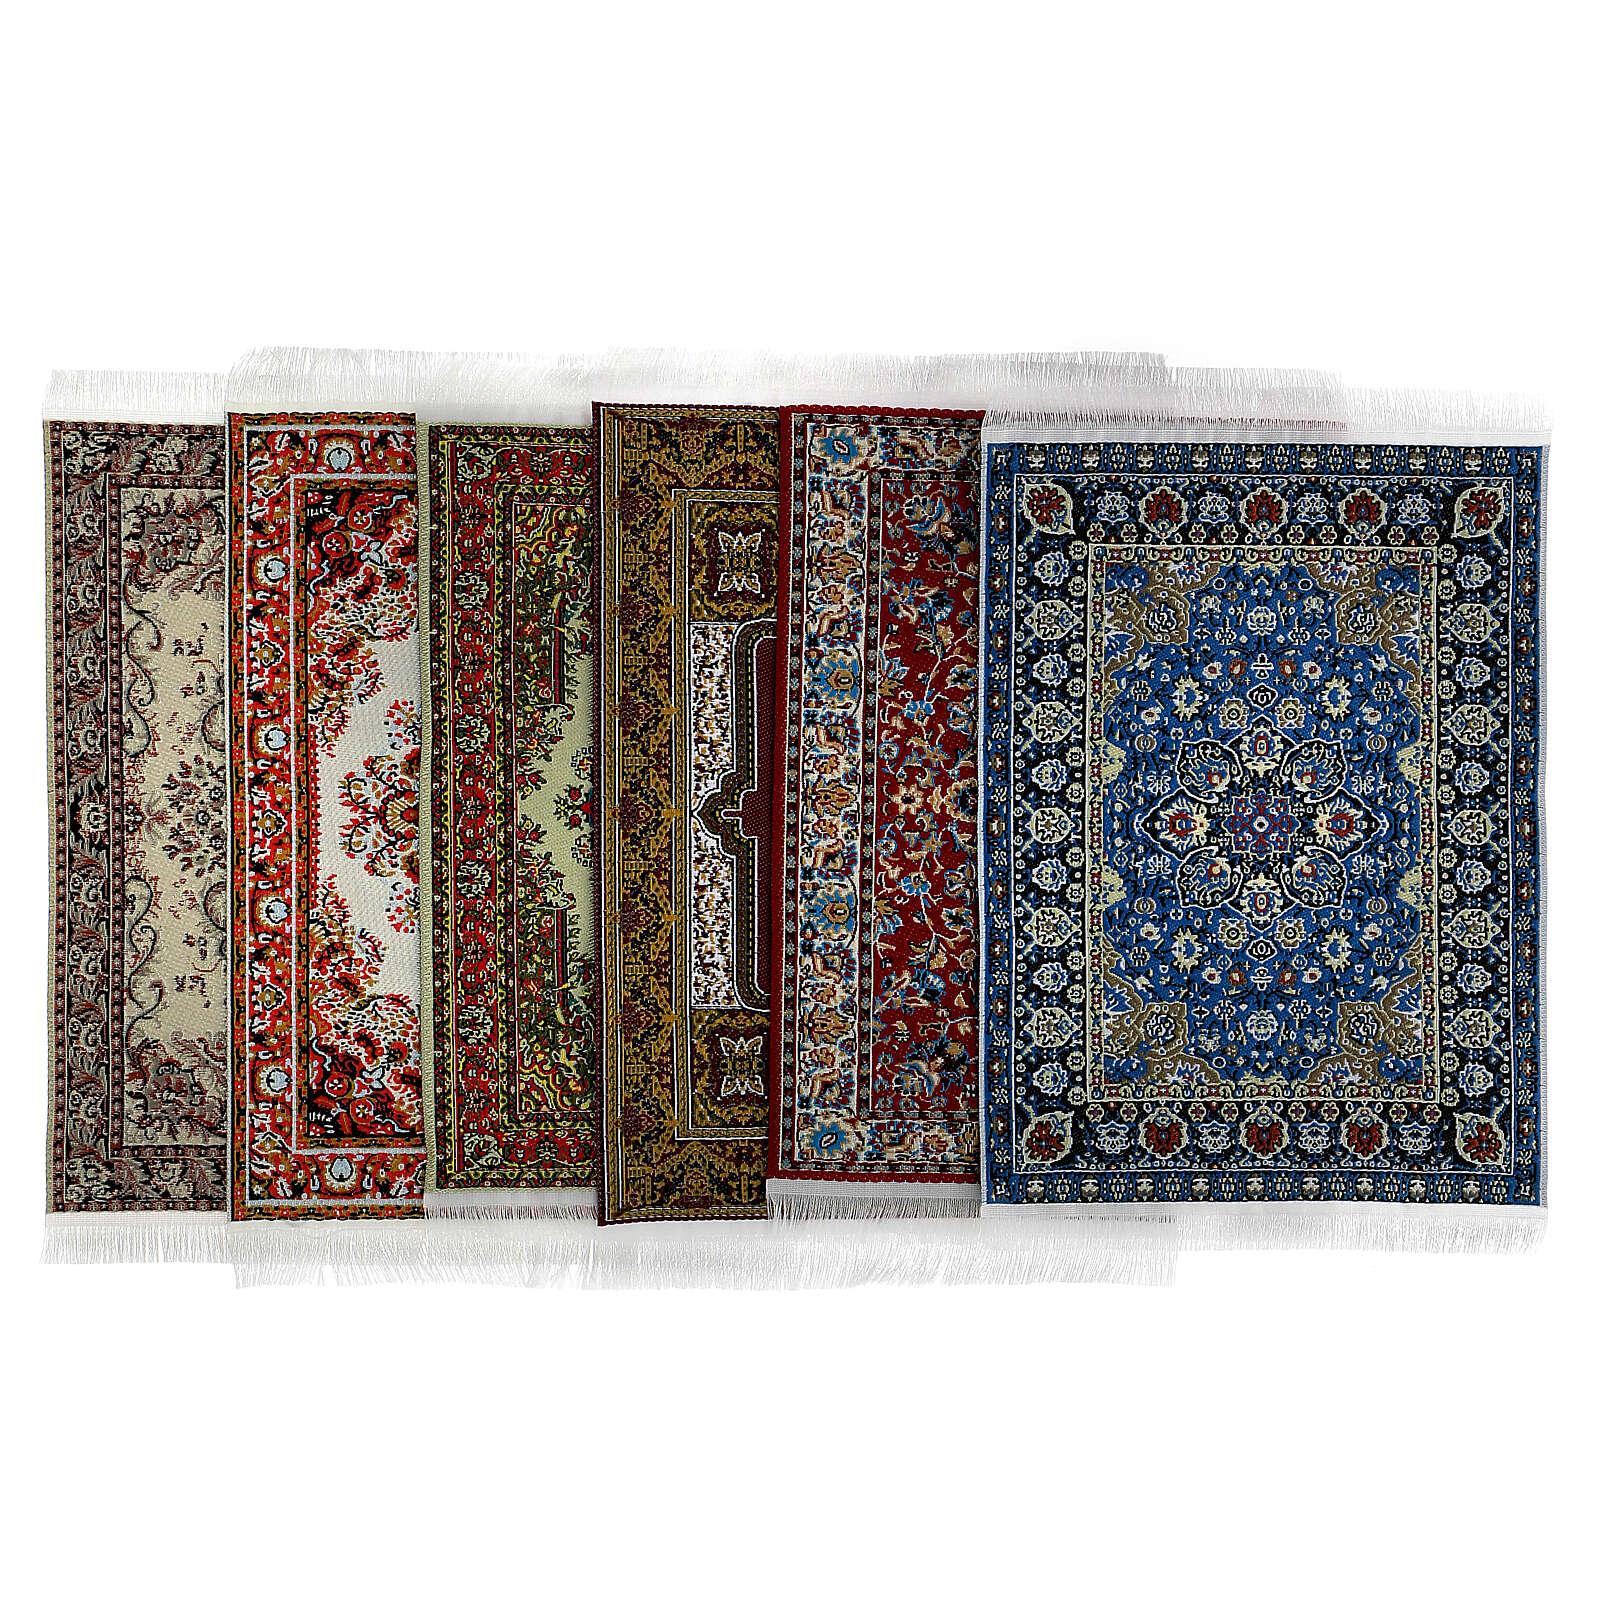 Set of 6 carpets different models 15x10 cm for Nativity Scene 4